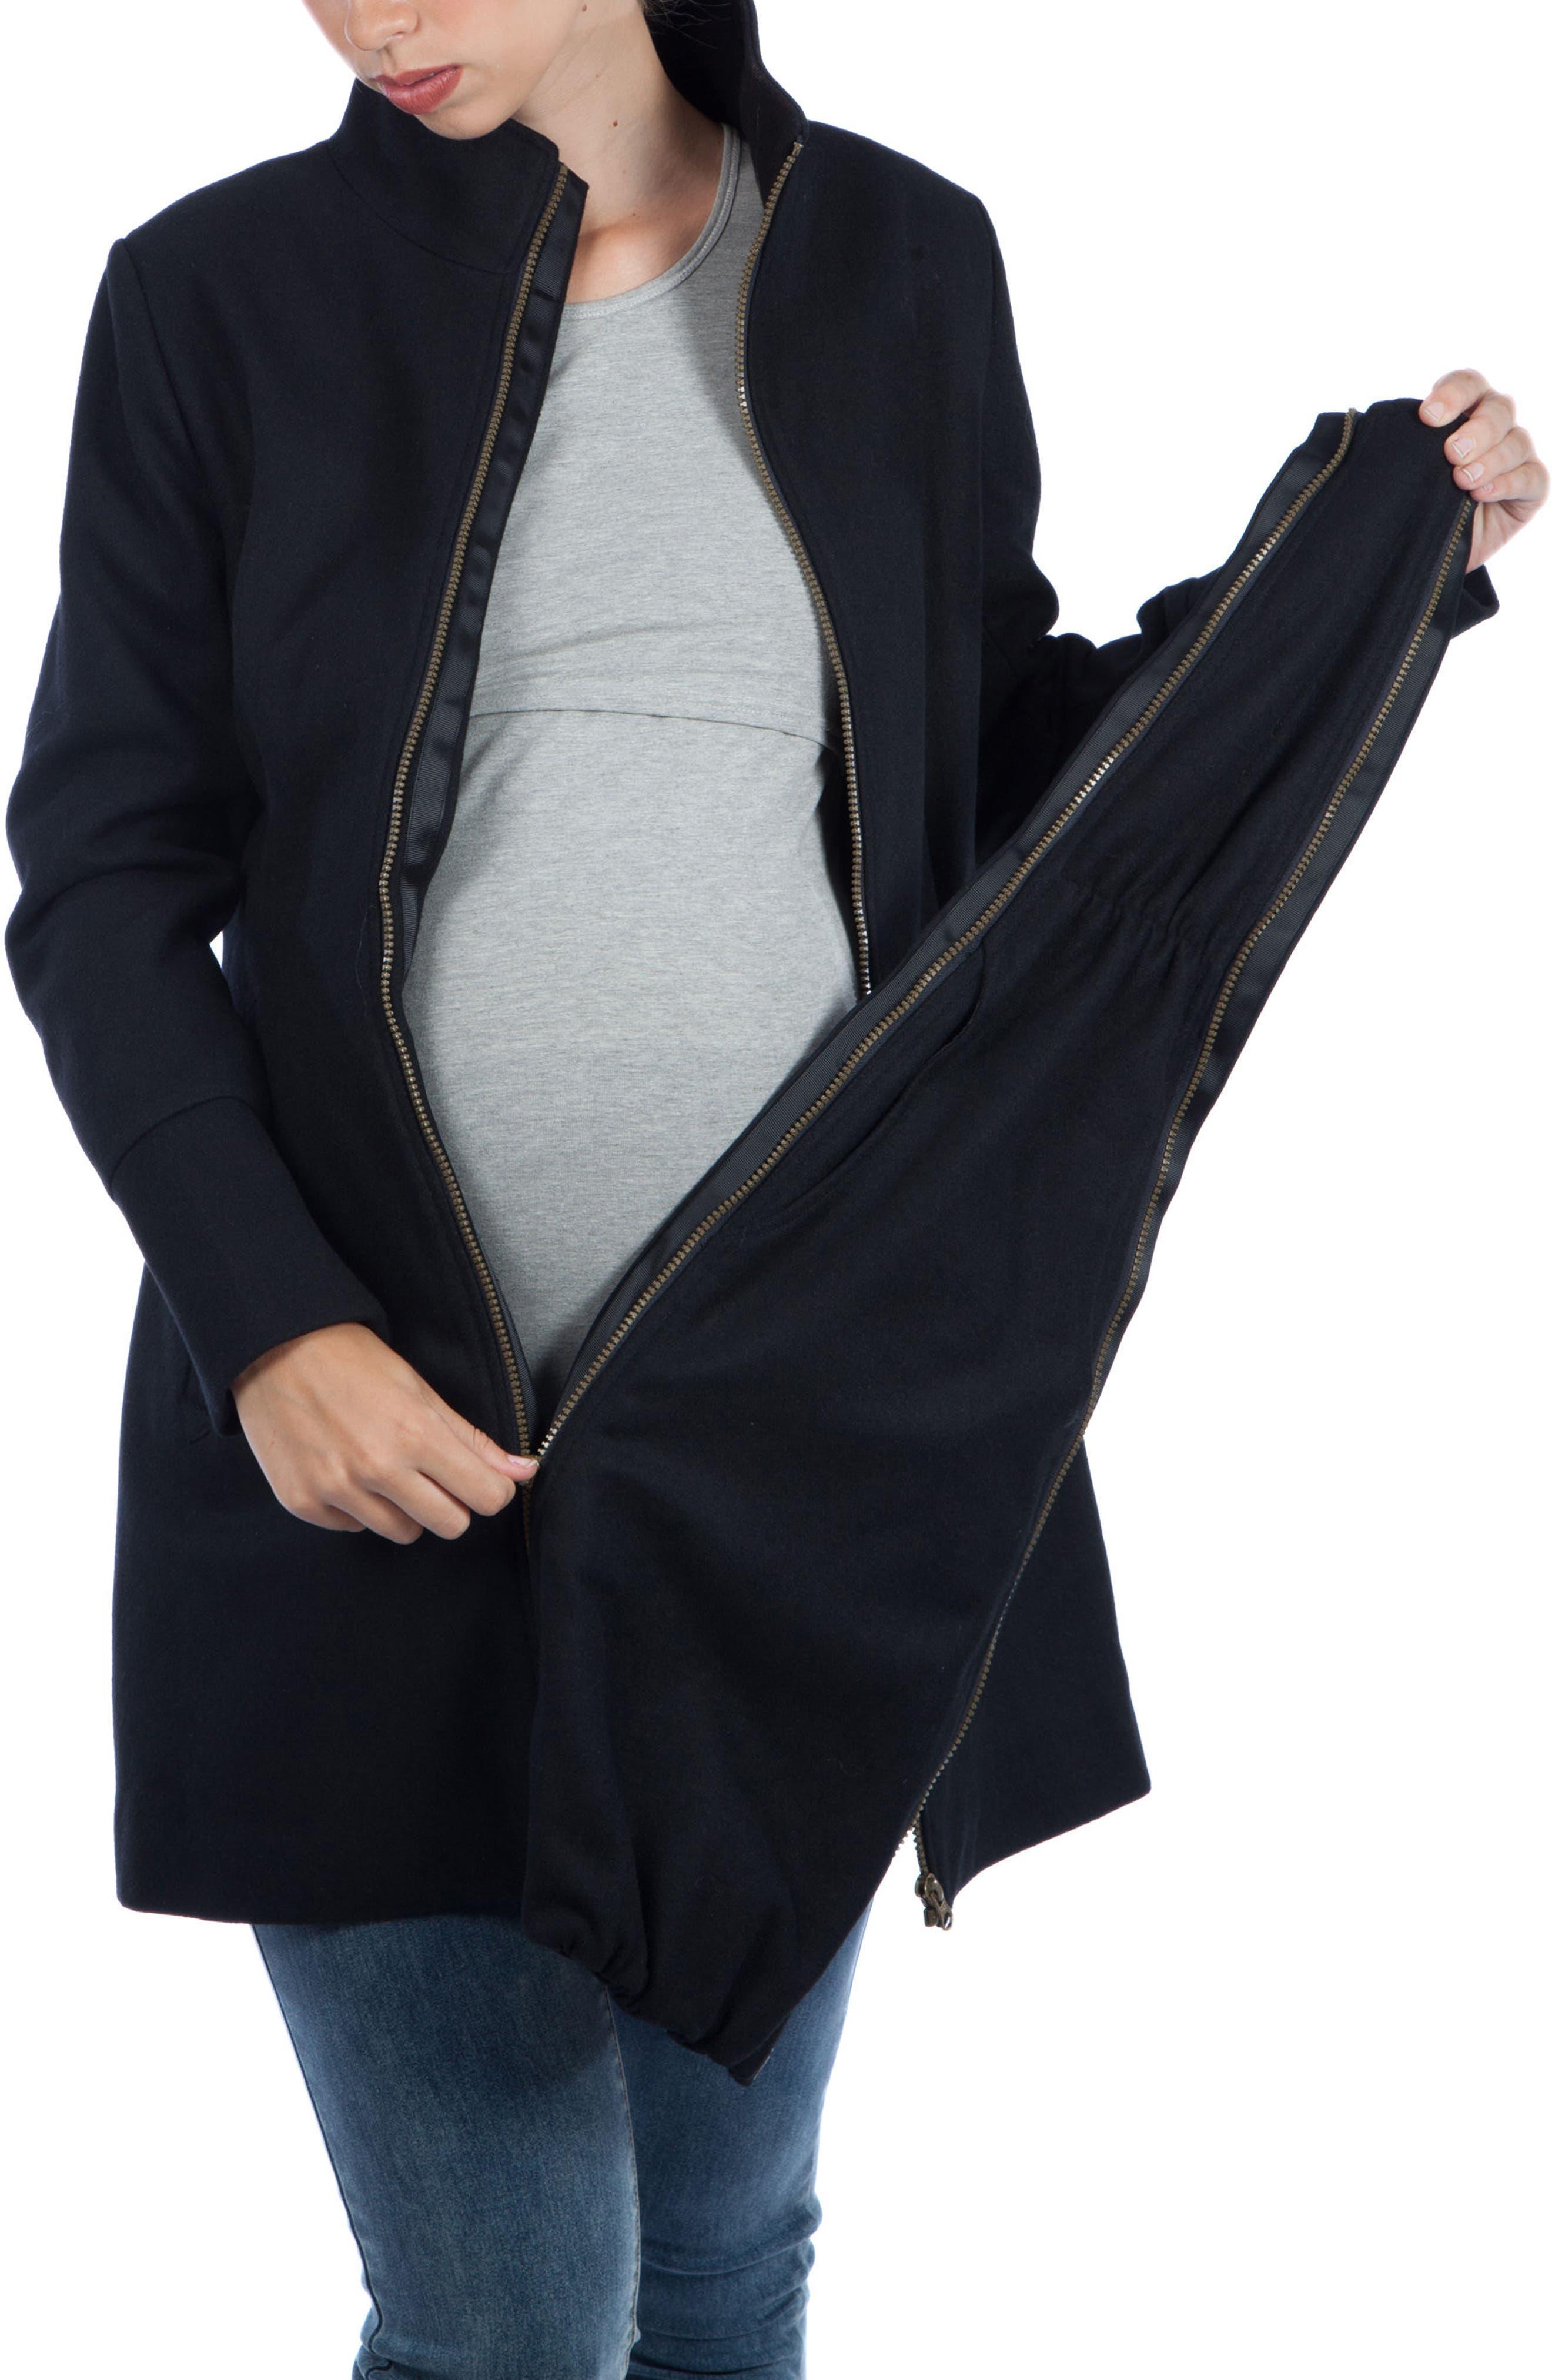 Convertible 3-in-1 Maternity/Nursing Coat,                             Alternate thumbnail 6, color,                             BLACK